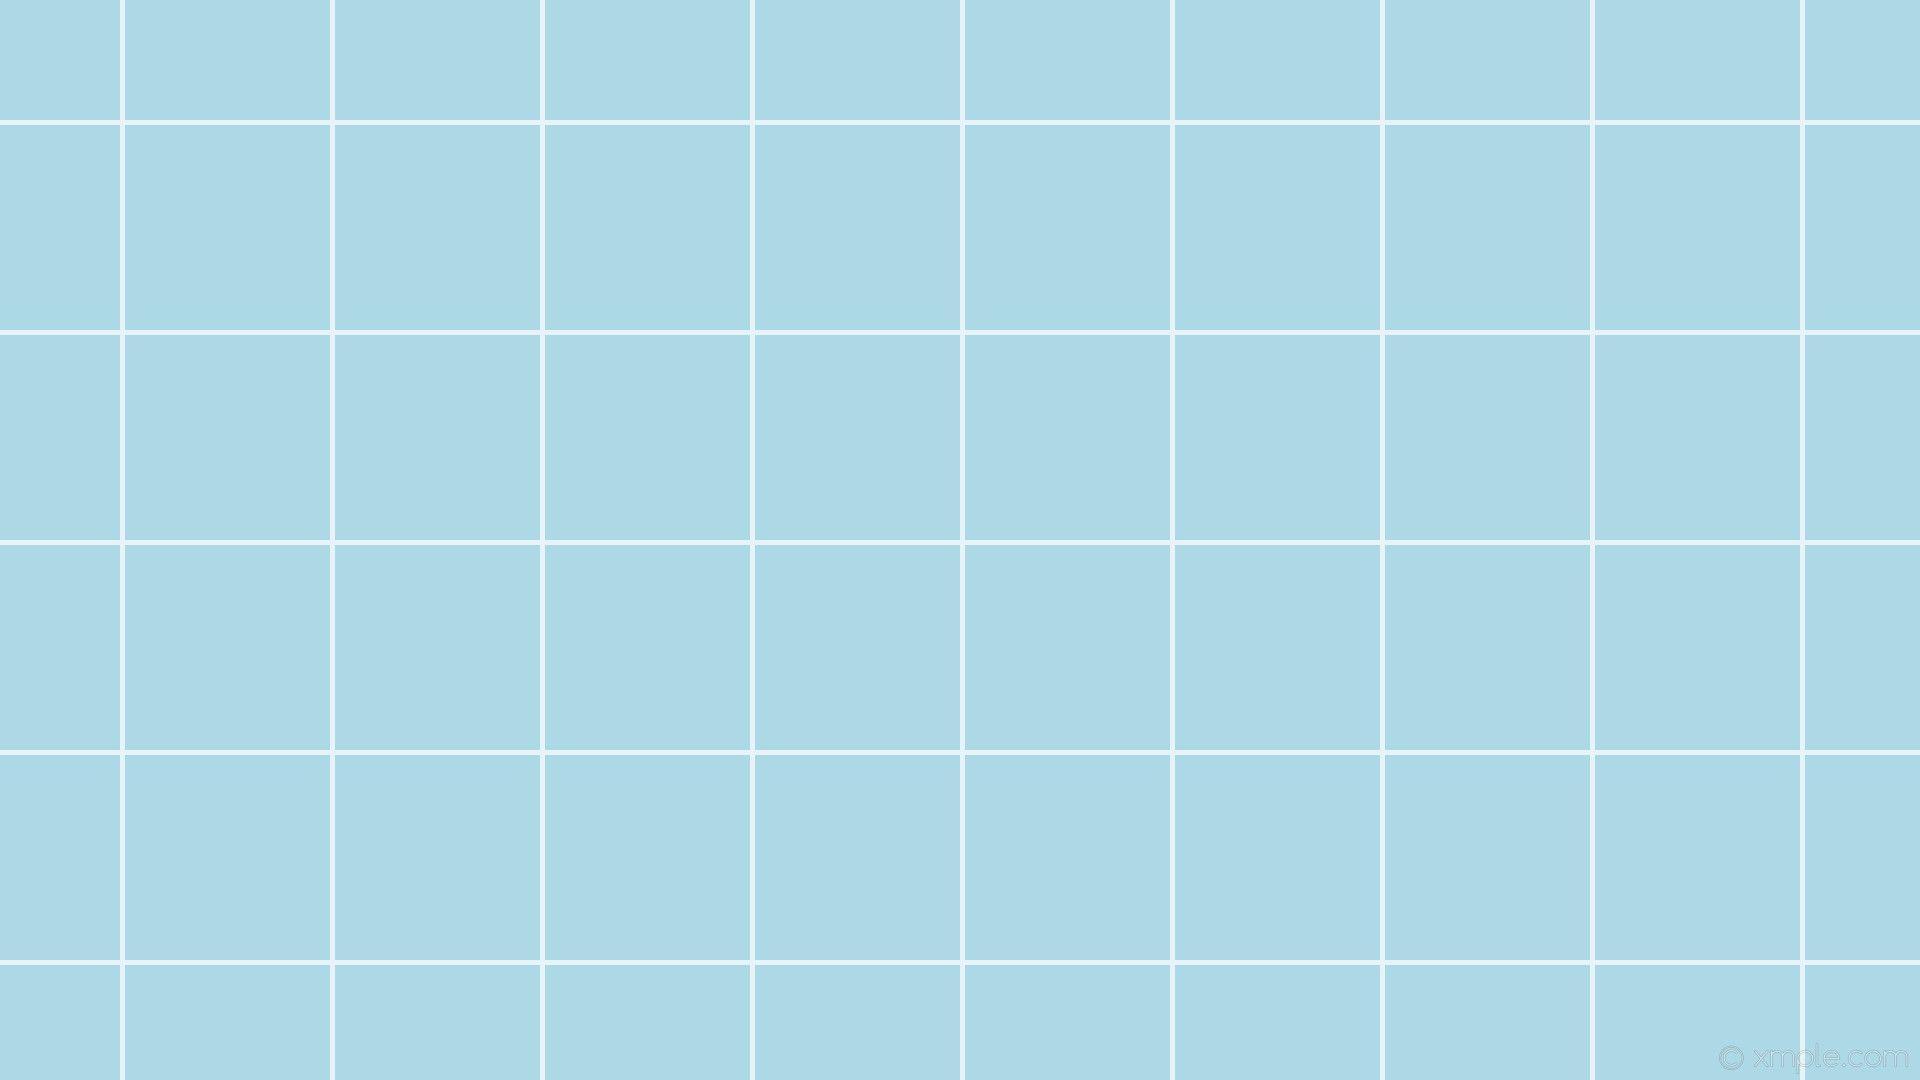 aesthetic horizontal wallpapers